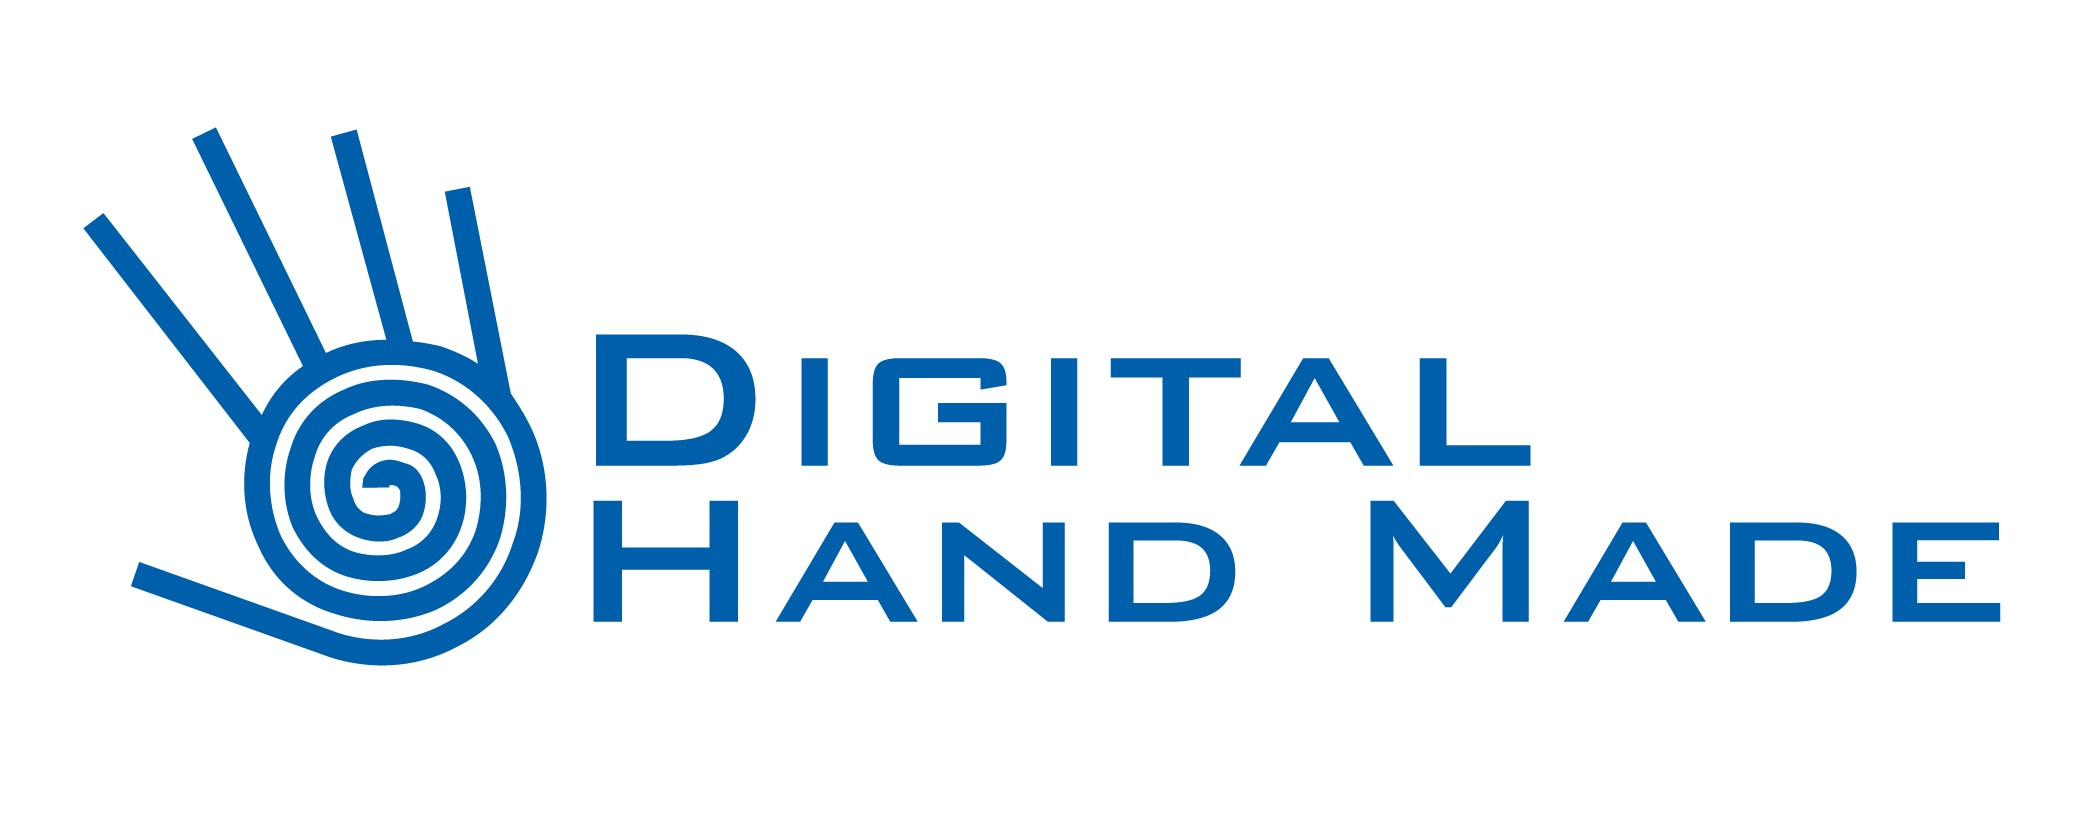 Digital Hand Made | LinkedIn